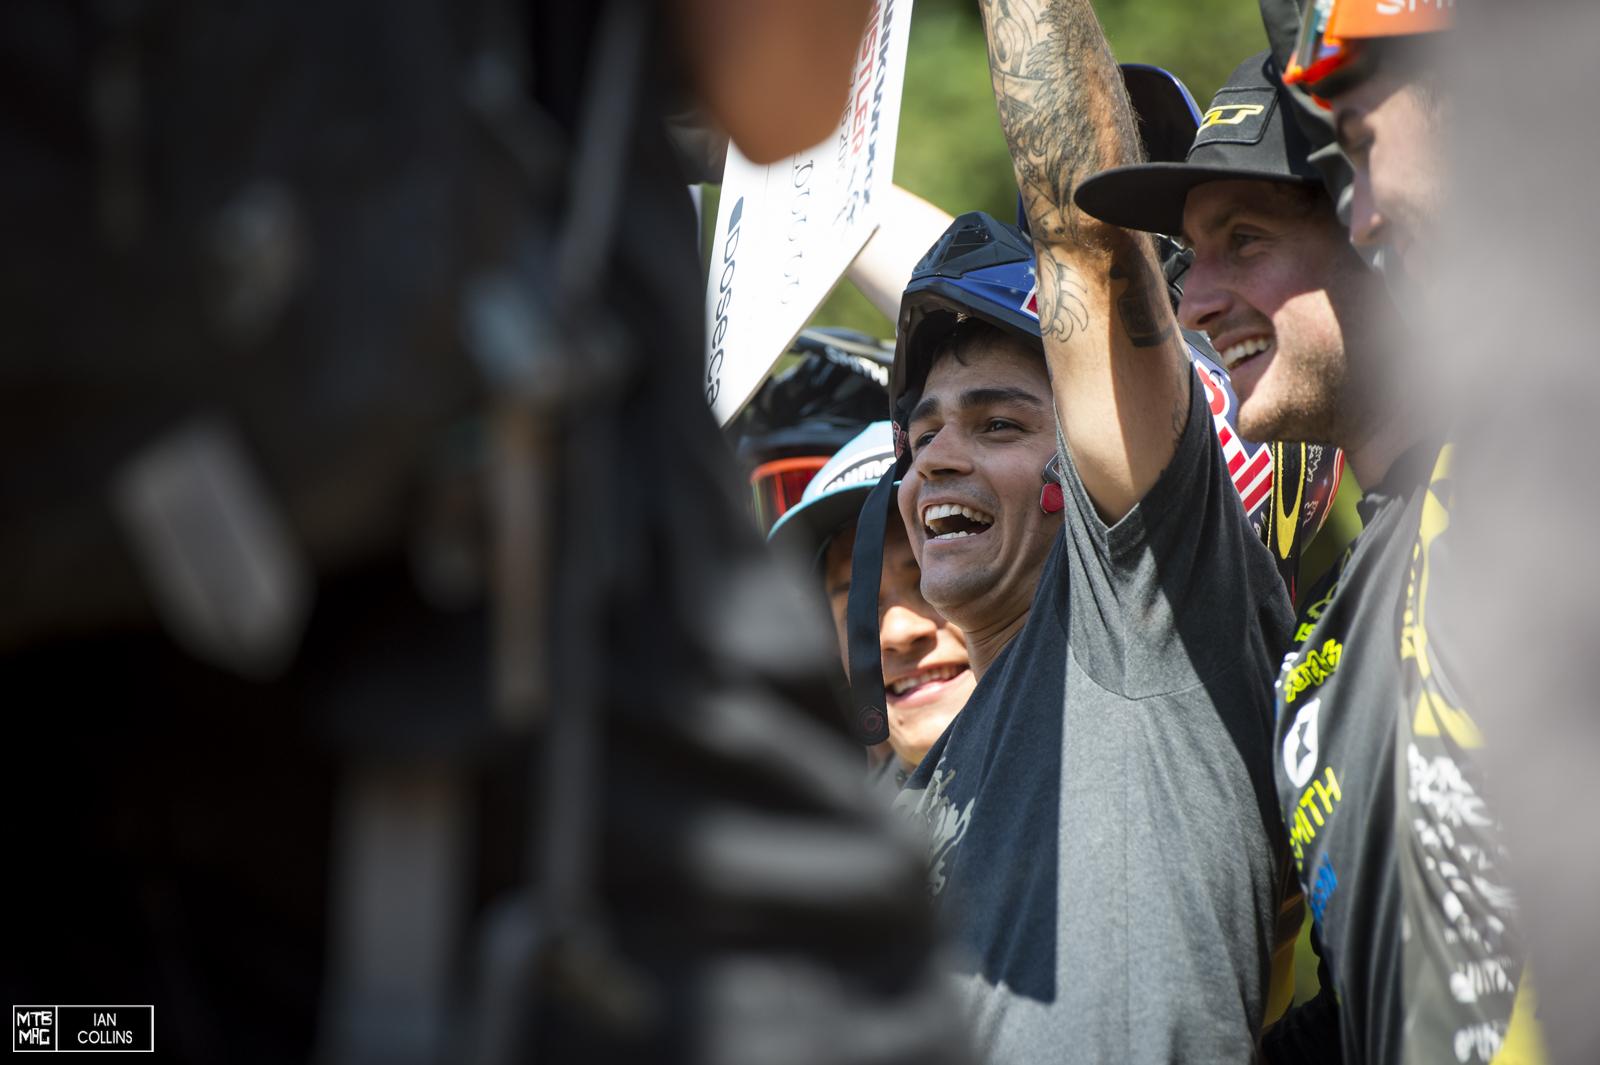 Andreu Lacondeguy, Bernardo Cruz & R - Dog round out the top 3 in the men's.